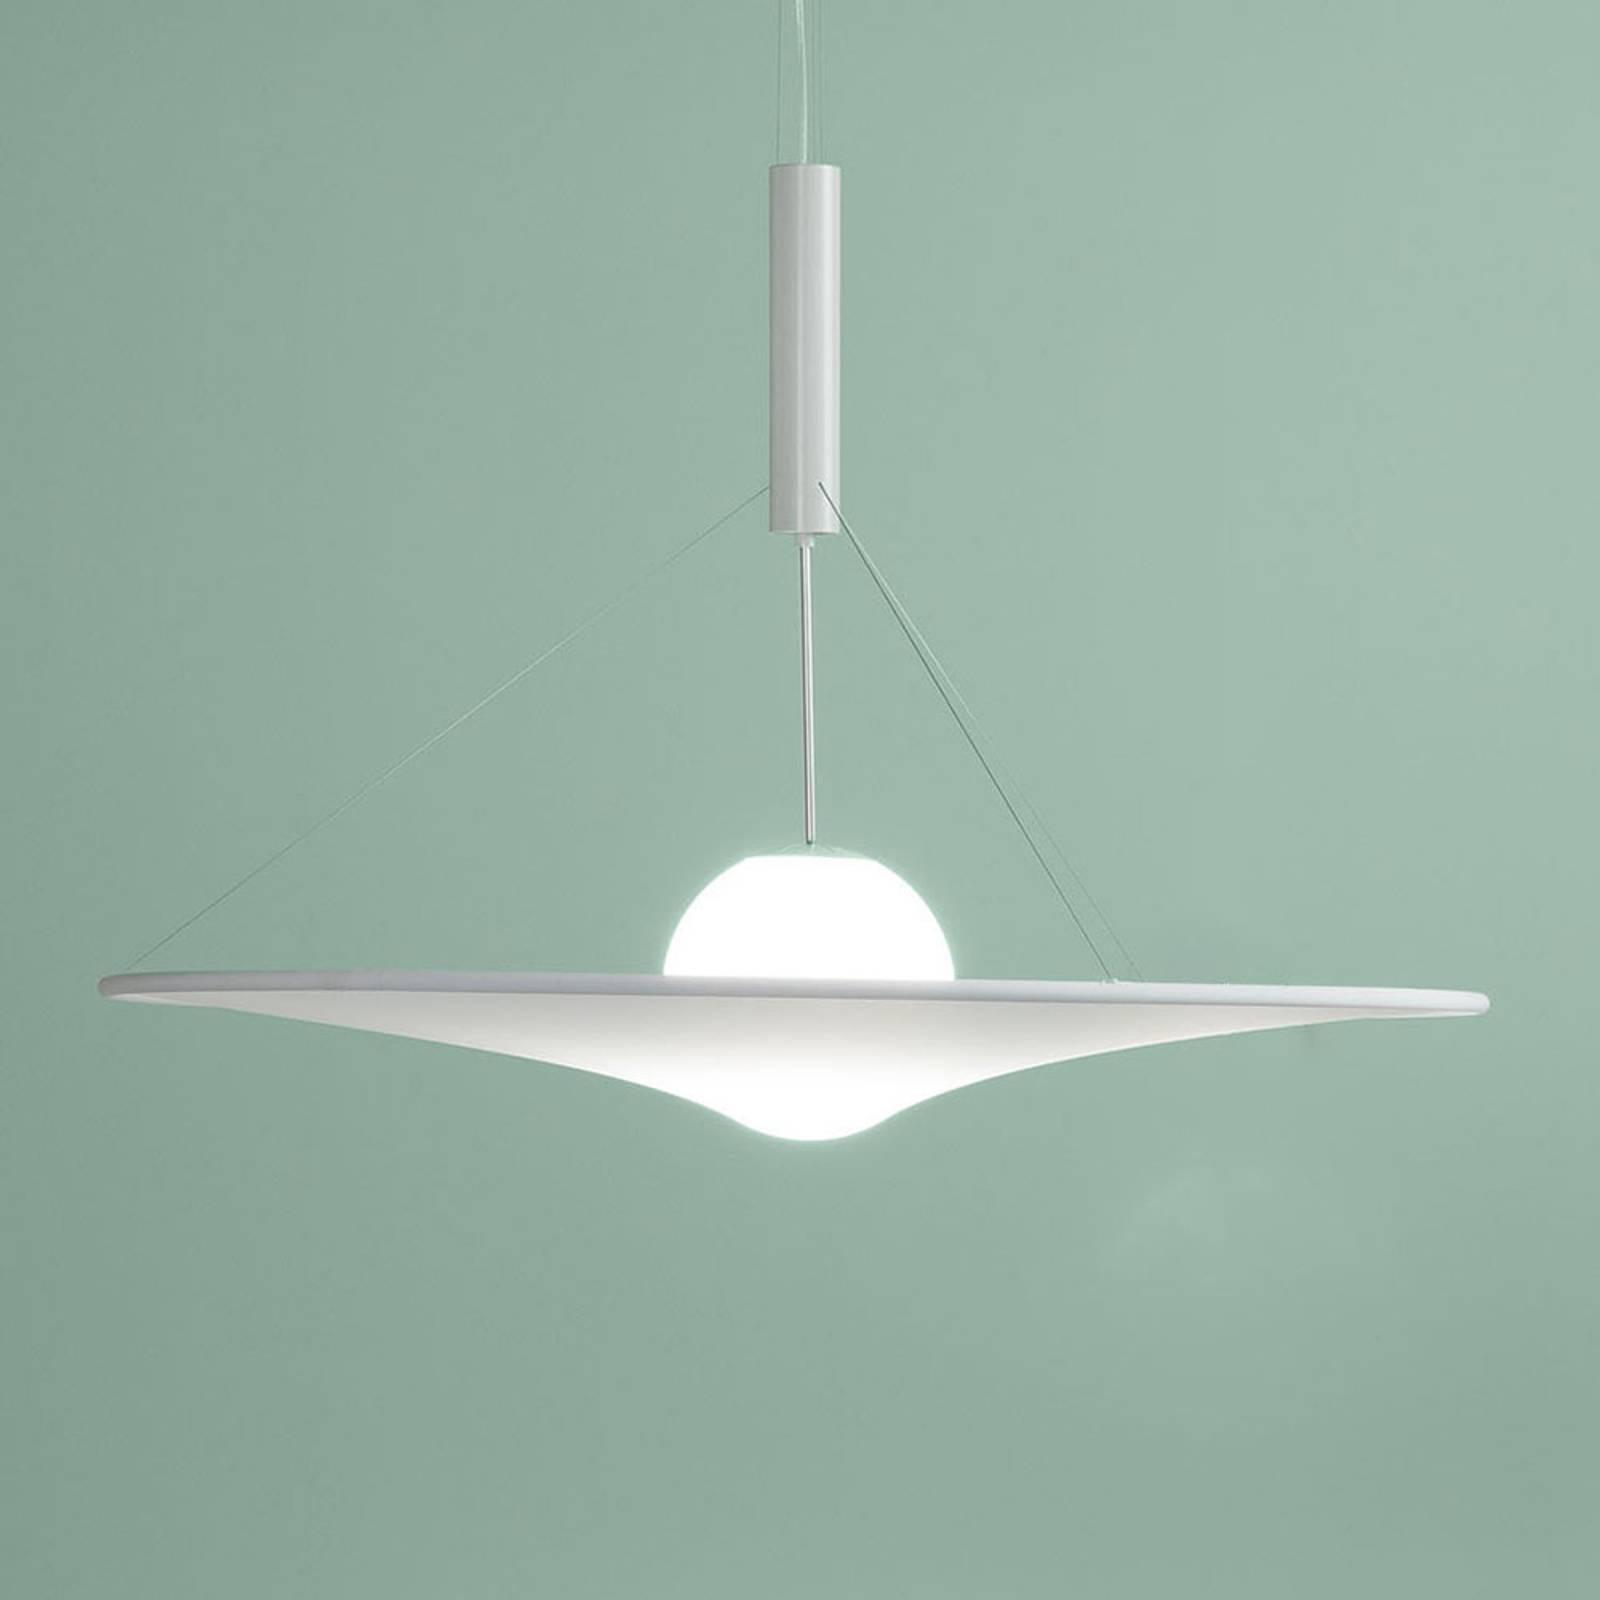 Axolight Manto LED-designer-riippuvalaisin Ø 180cm